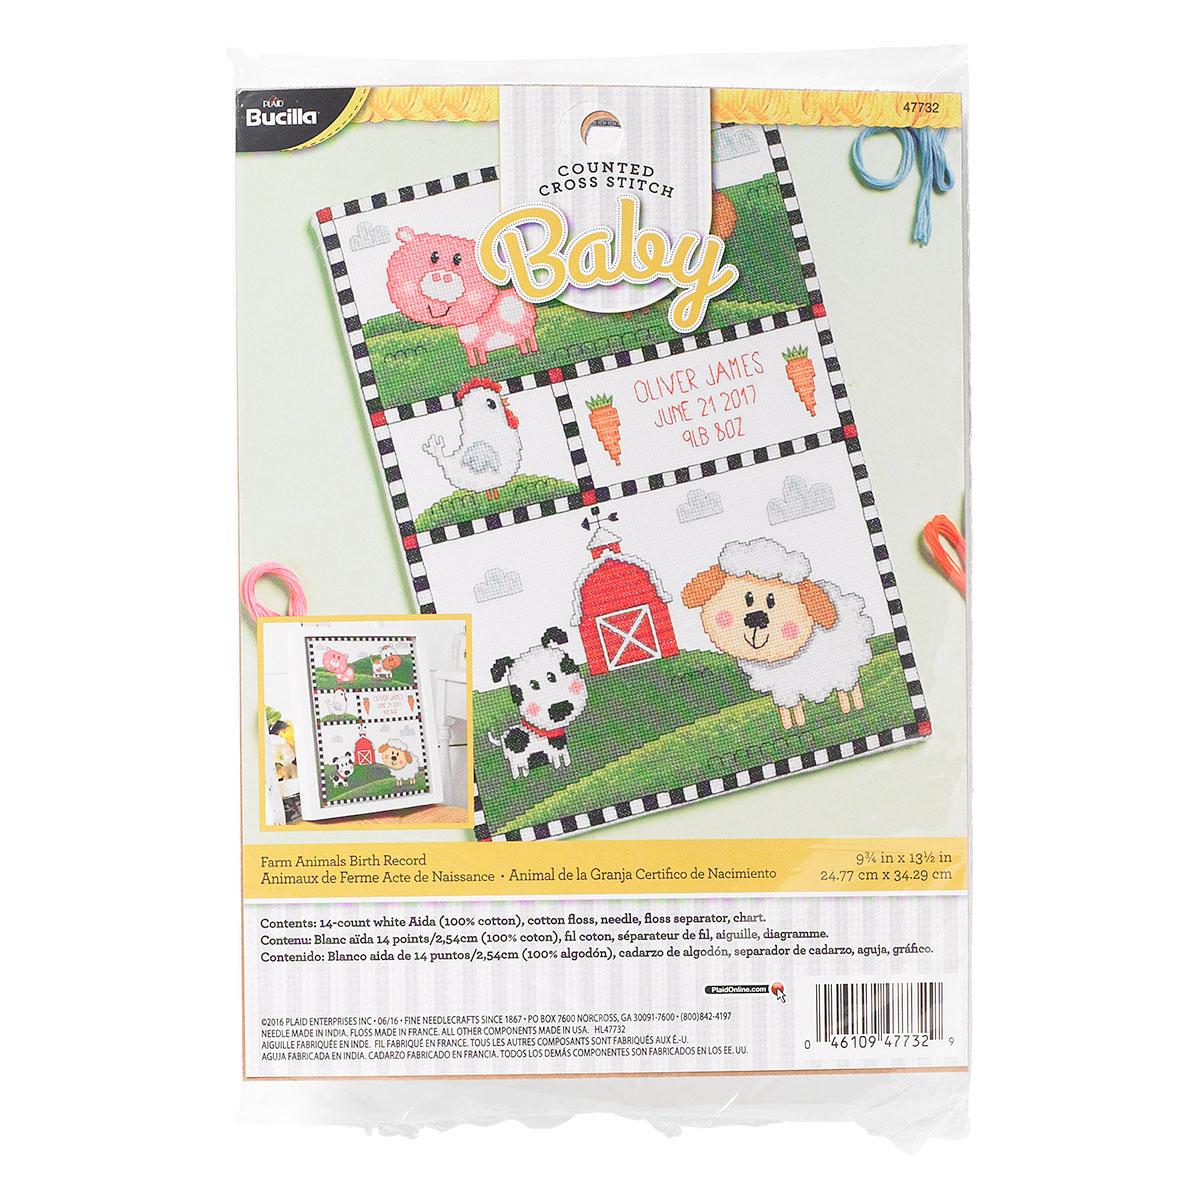 Bucilla ® Baby - Counted Cross Stitch - Crib Ensembles - Farm Animals - Birth Record Kit